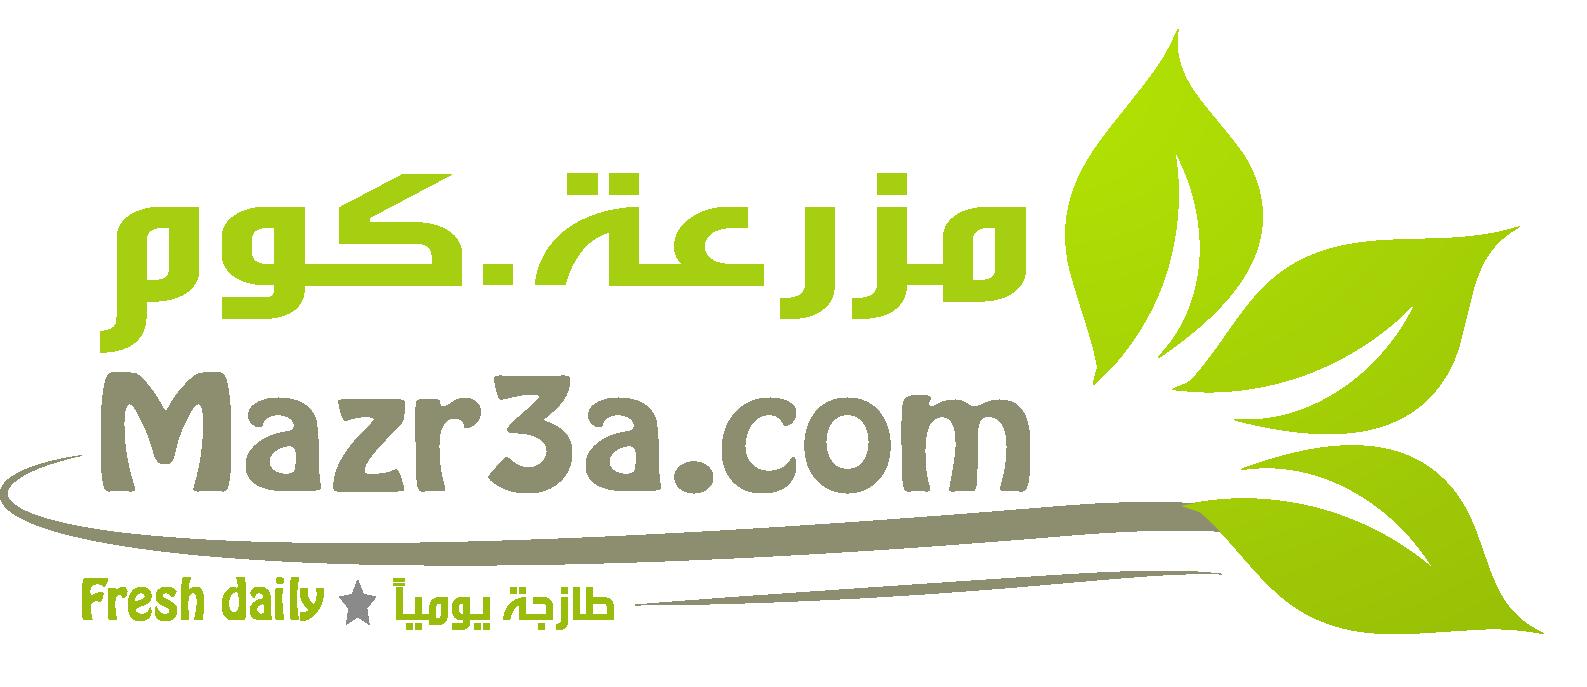 مـزرعـة.كـوم | MAZR3A.COM